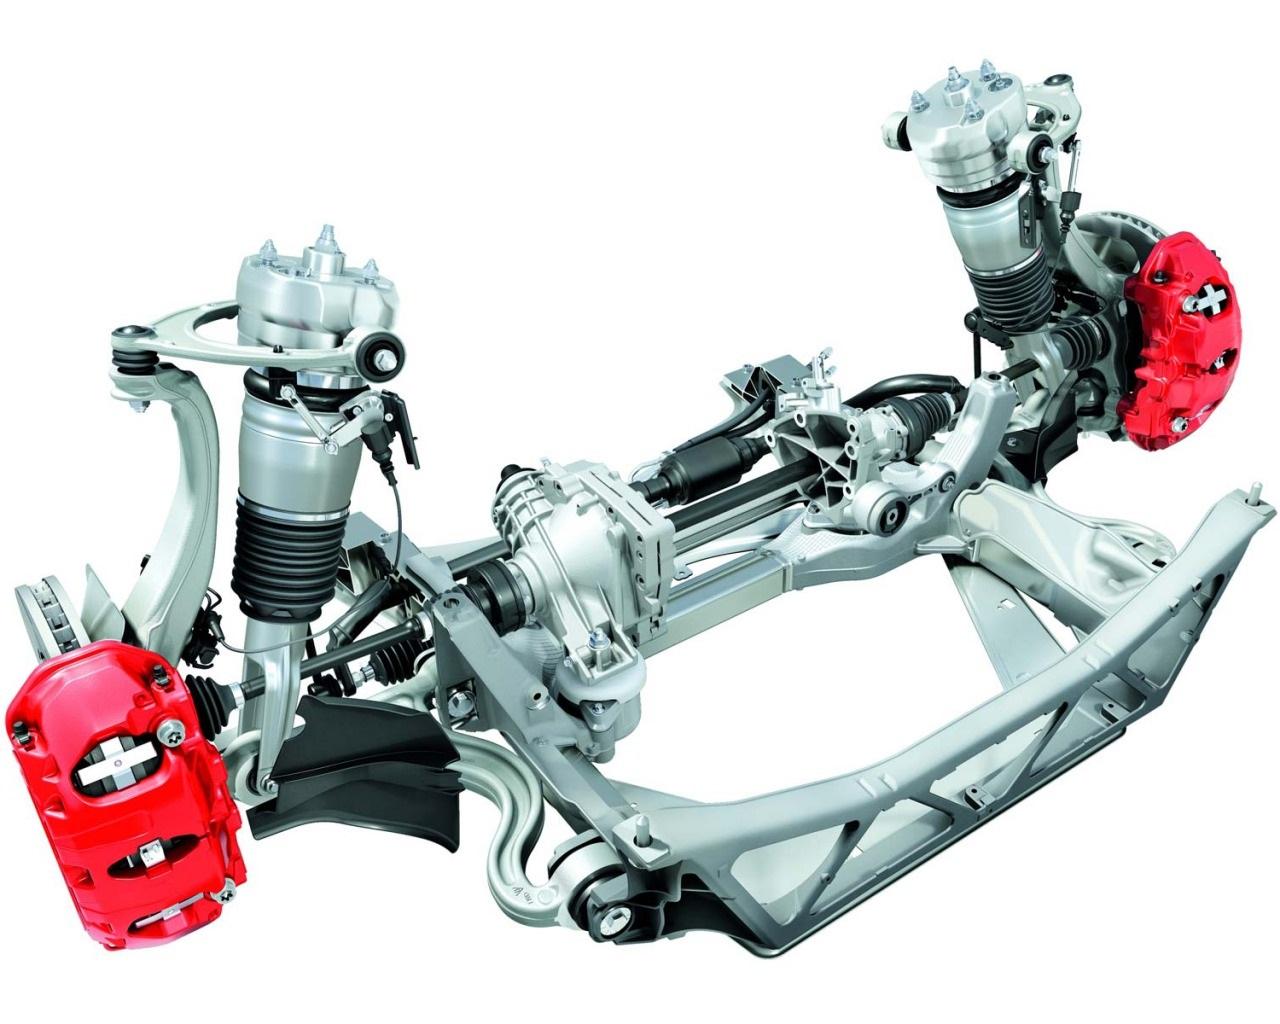 Porsche-Panamera-front-suspensionx1280x1024